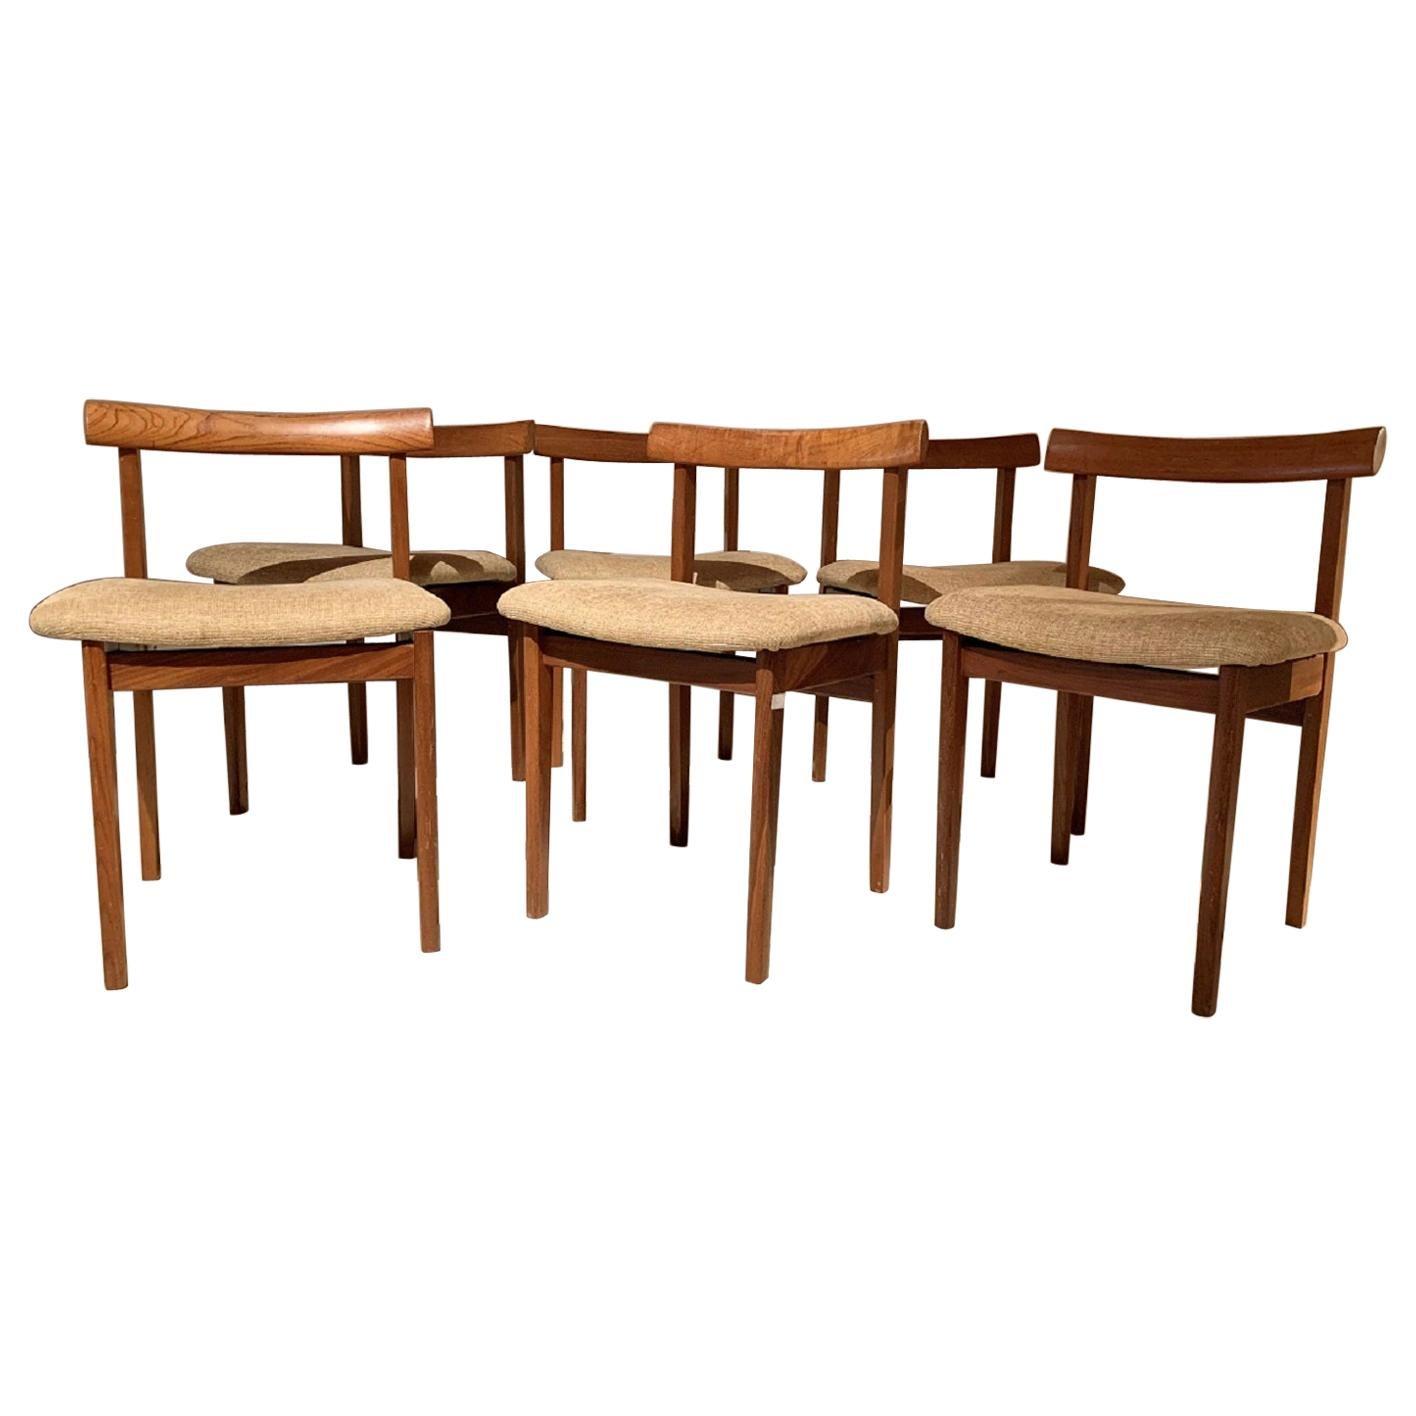 Set of 6 Midcentury English Chairs